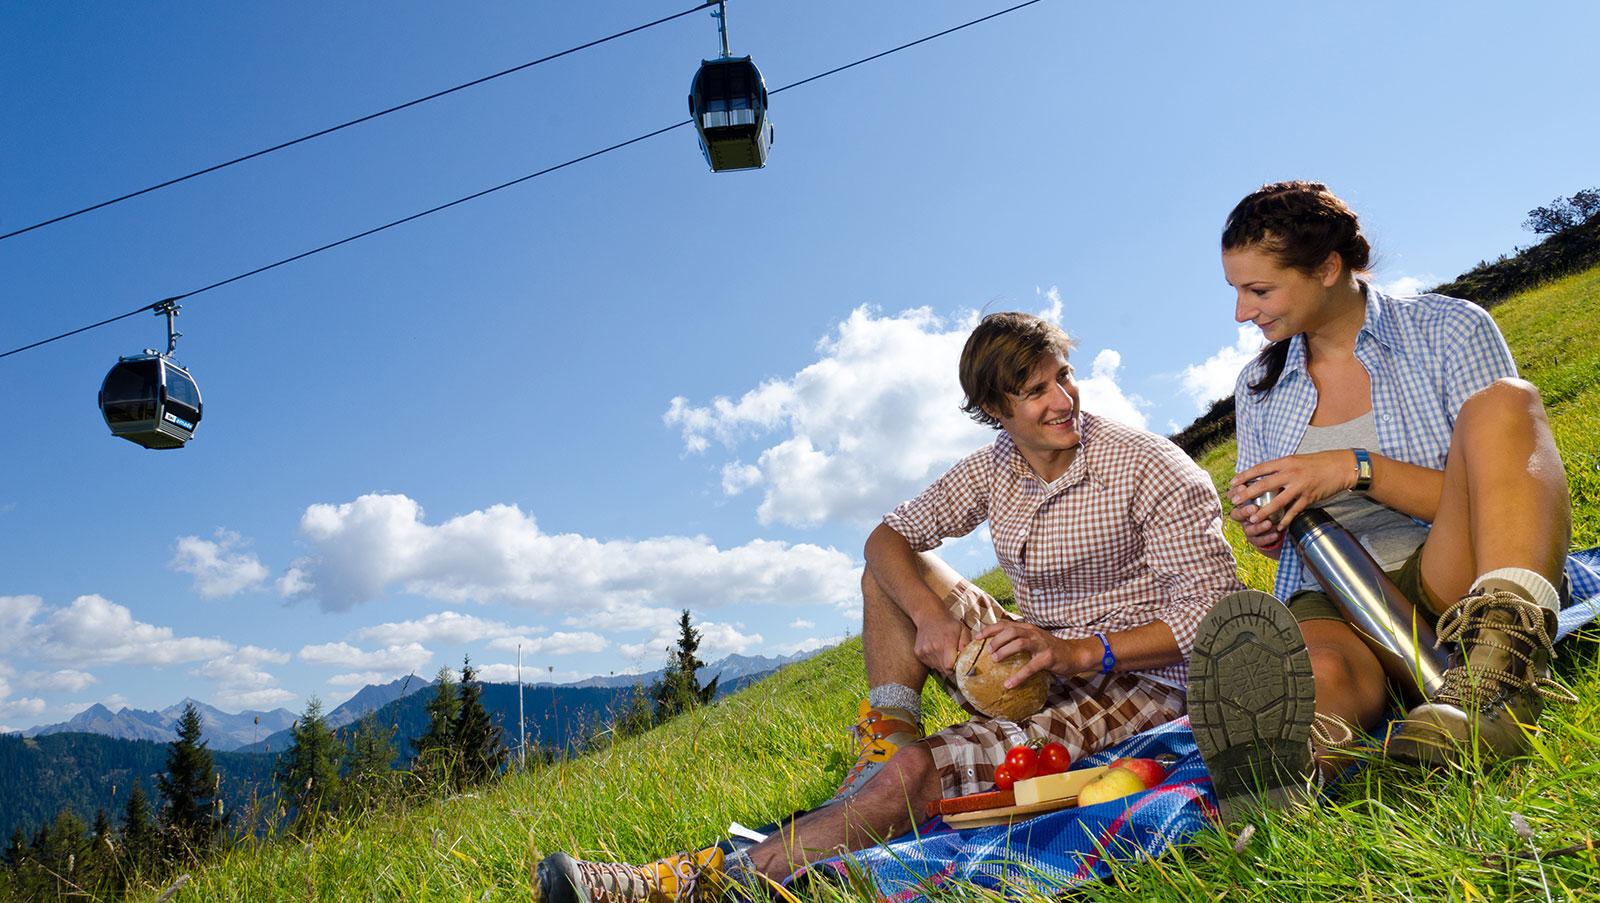 Hotel Grünholz - Erlebnisse im Sommer